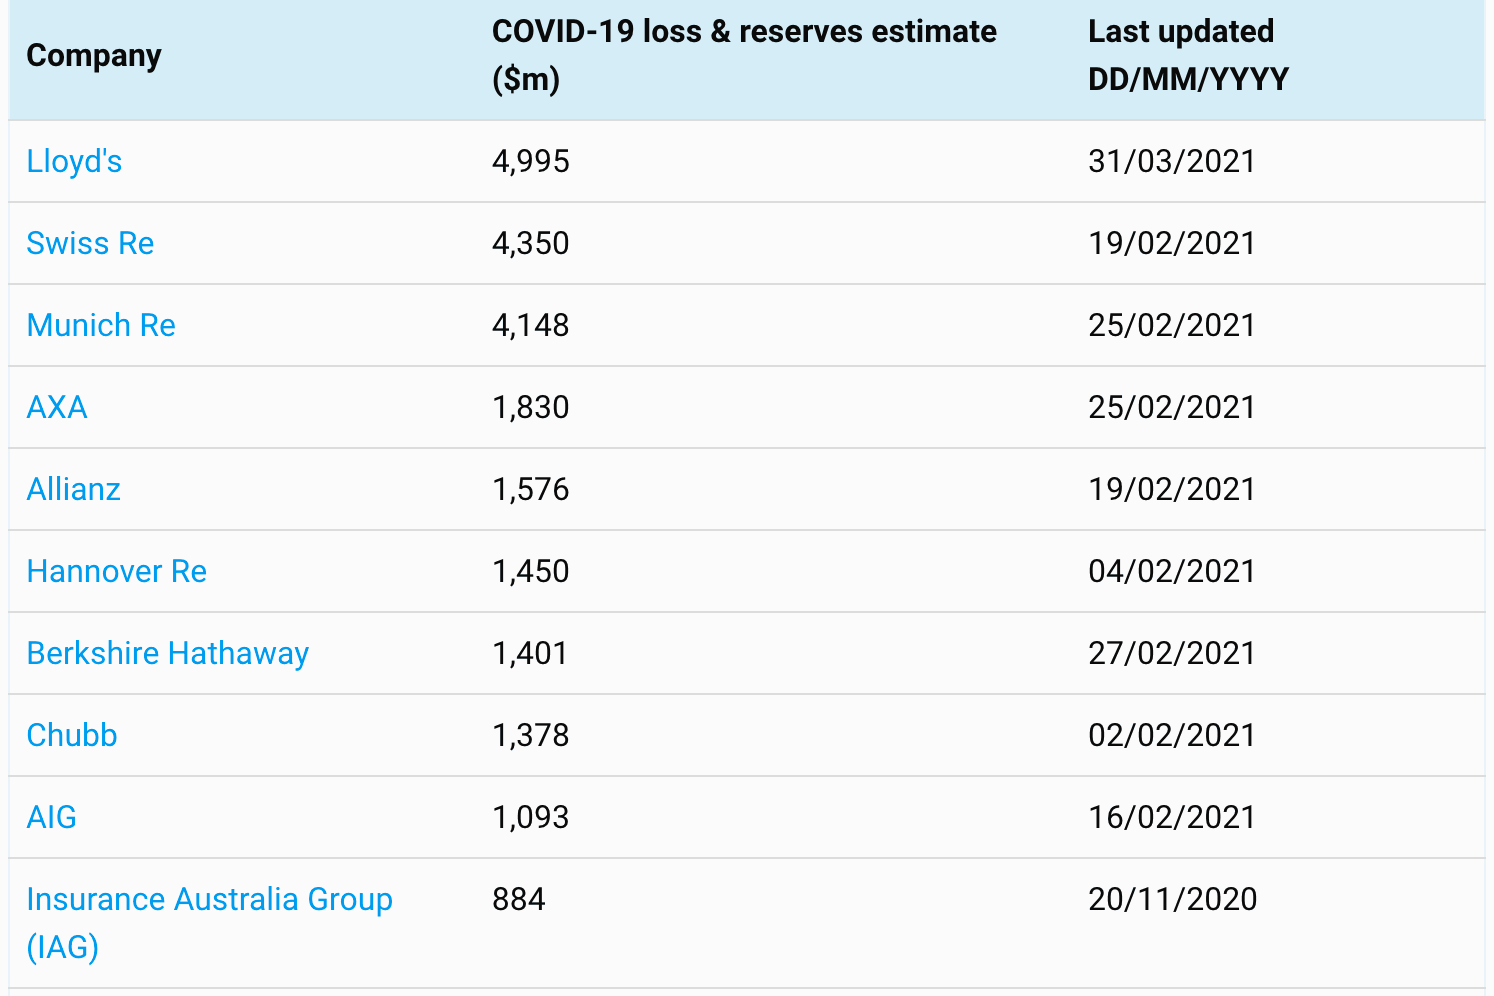 COVID insurance reinsurance market losses